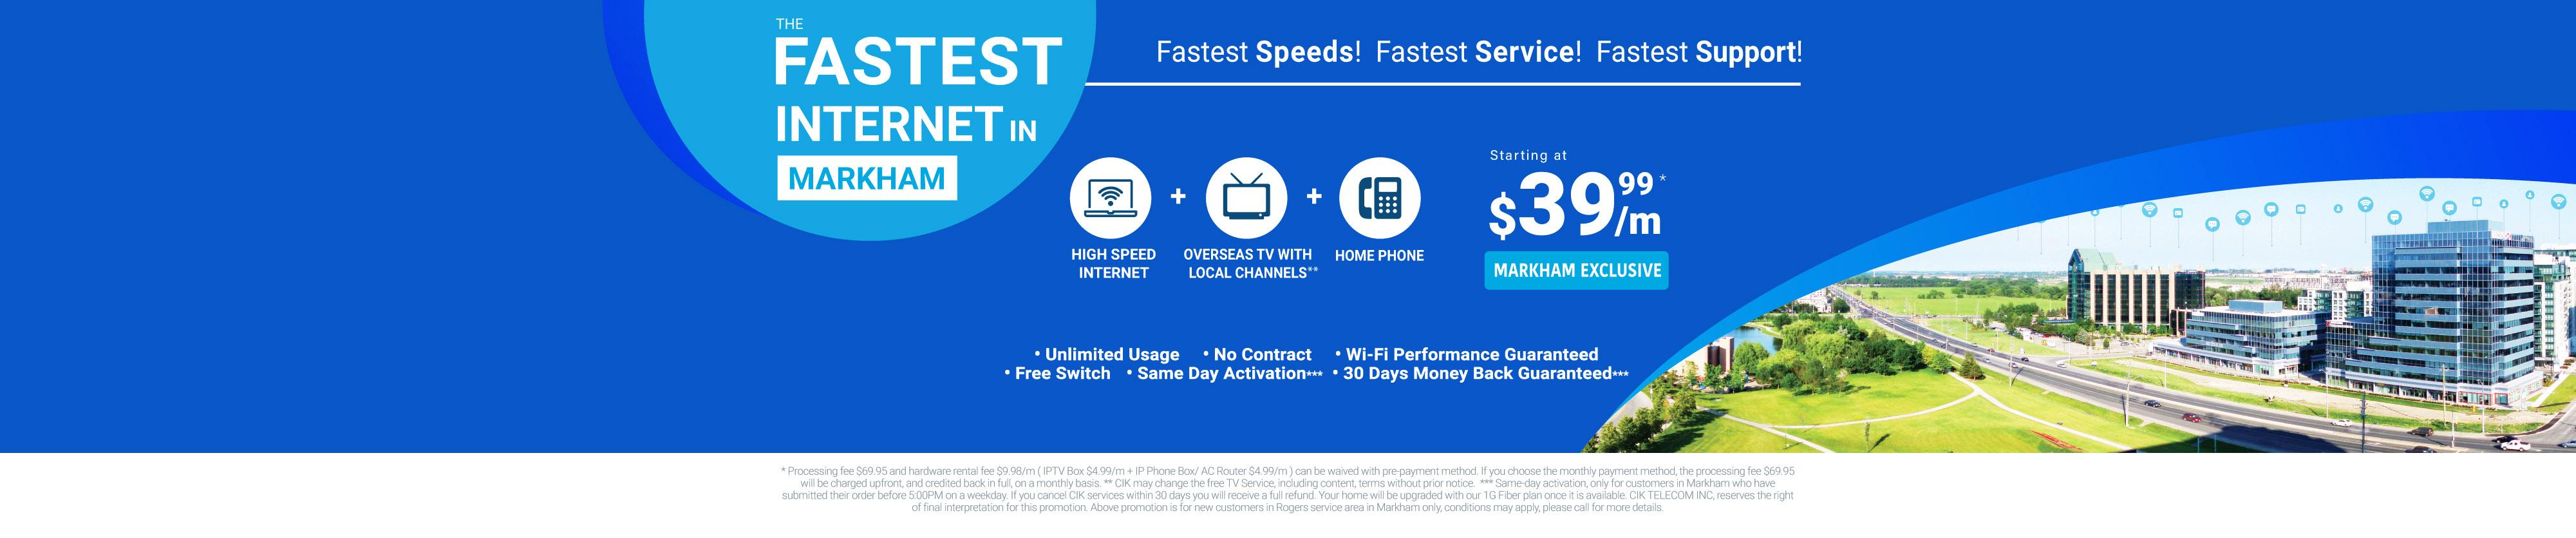 CIK Telecom - Top Internet Service Provider in Canada